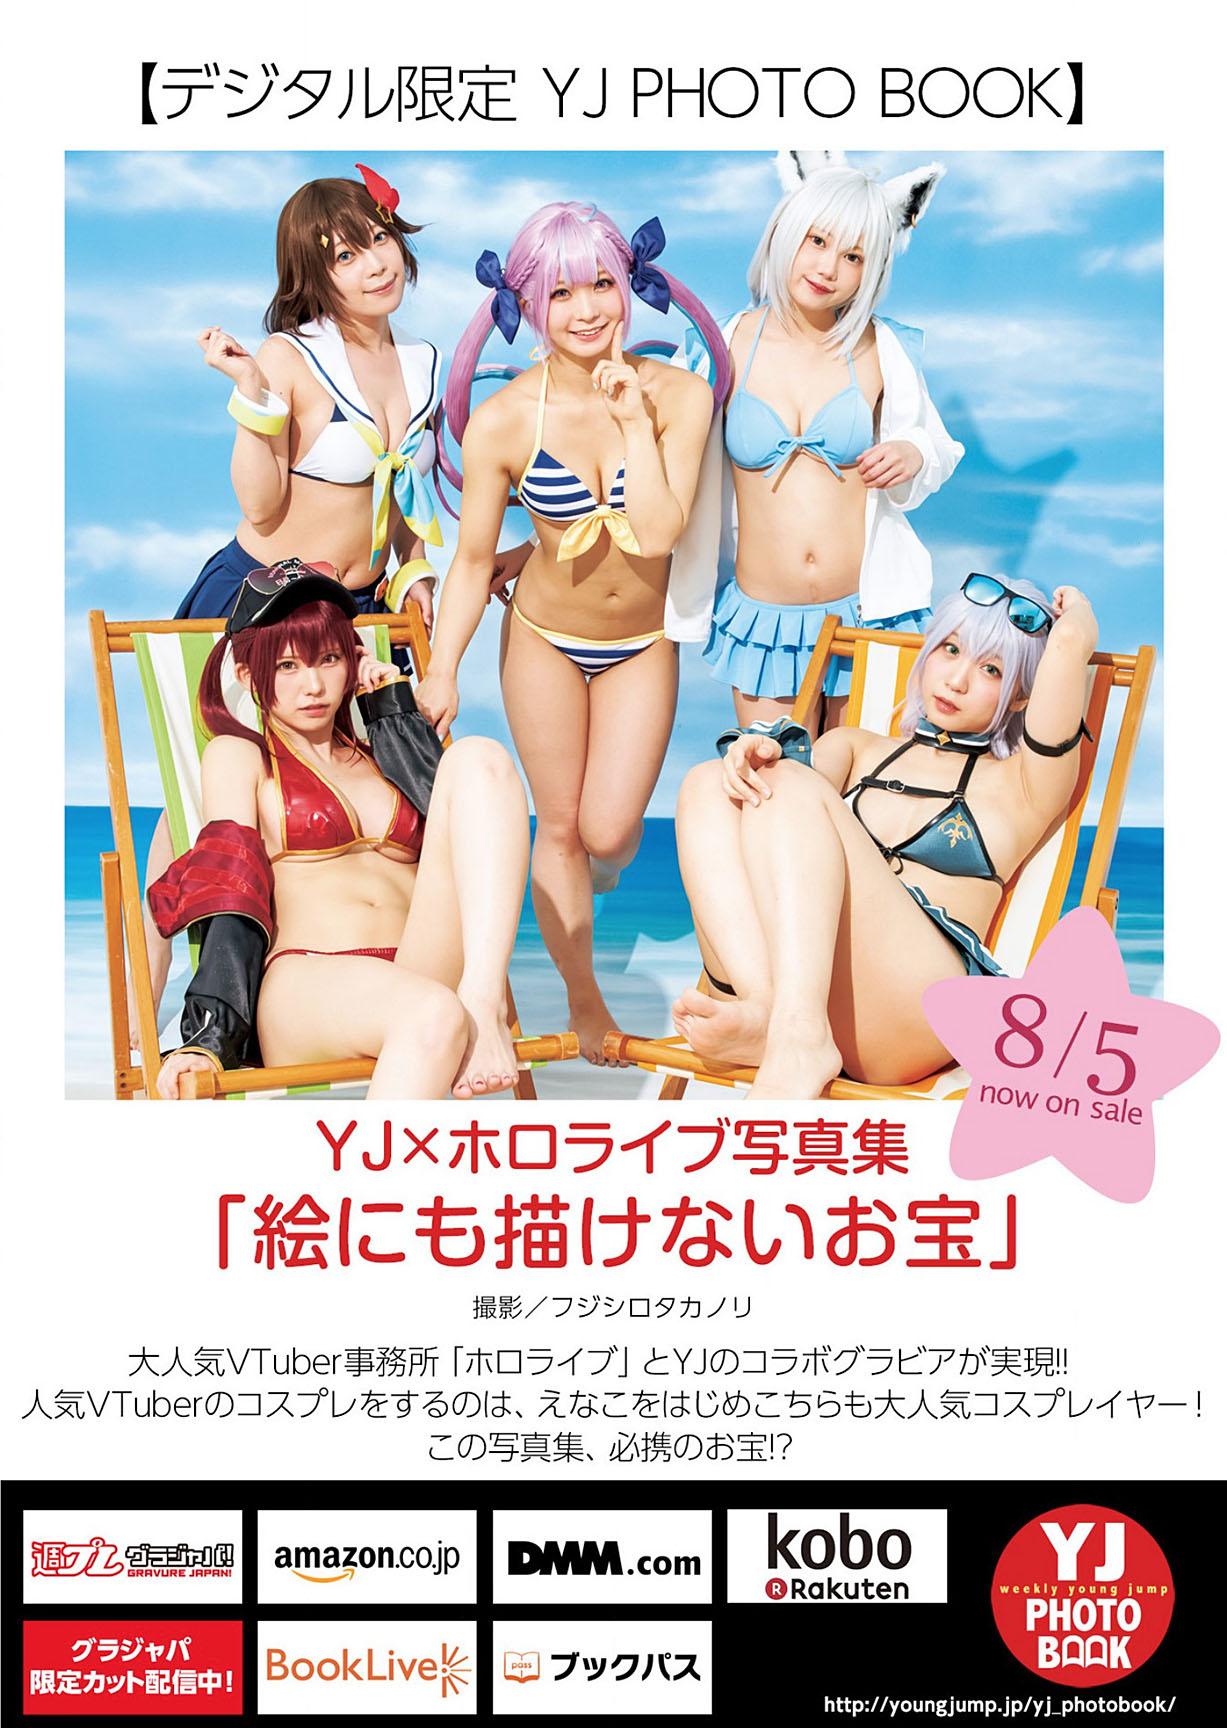 Enako Young Jump 210826 07.jpg